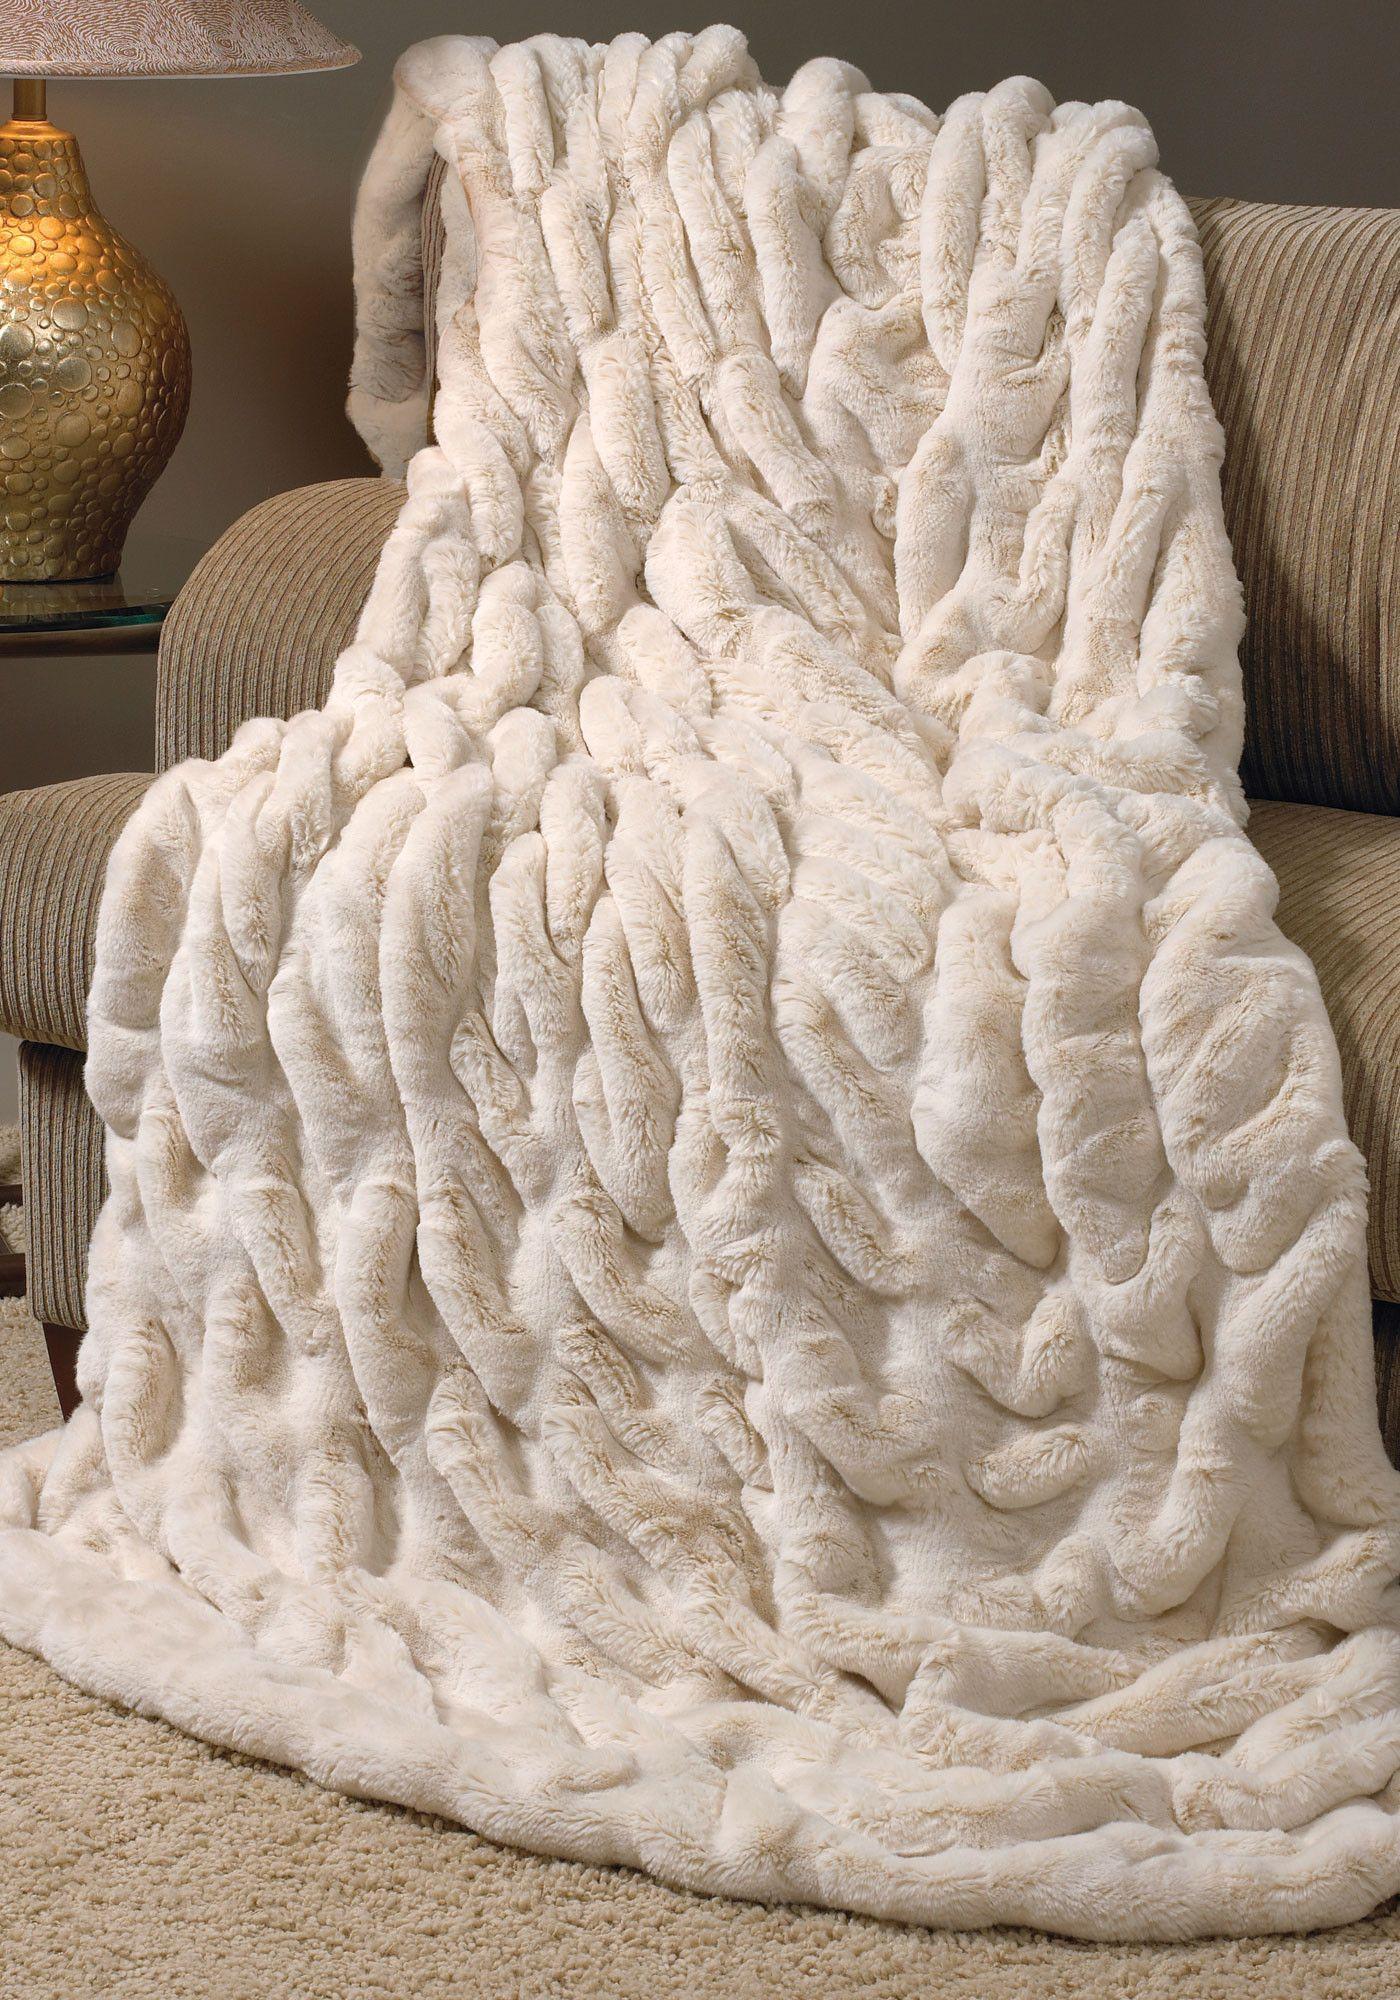 Ivory Mink Couture Faux Fur Throw | Wohnzimmer